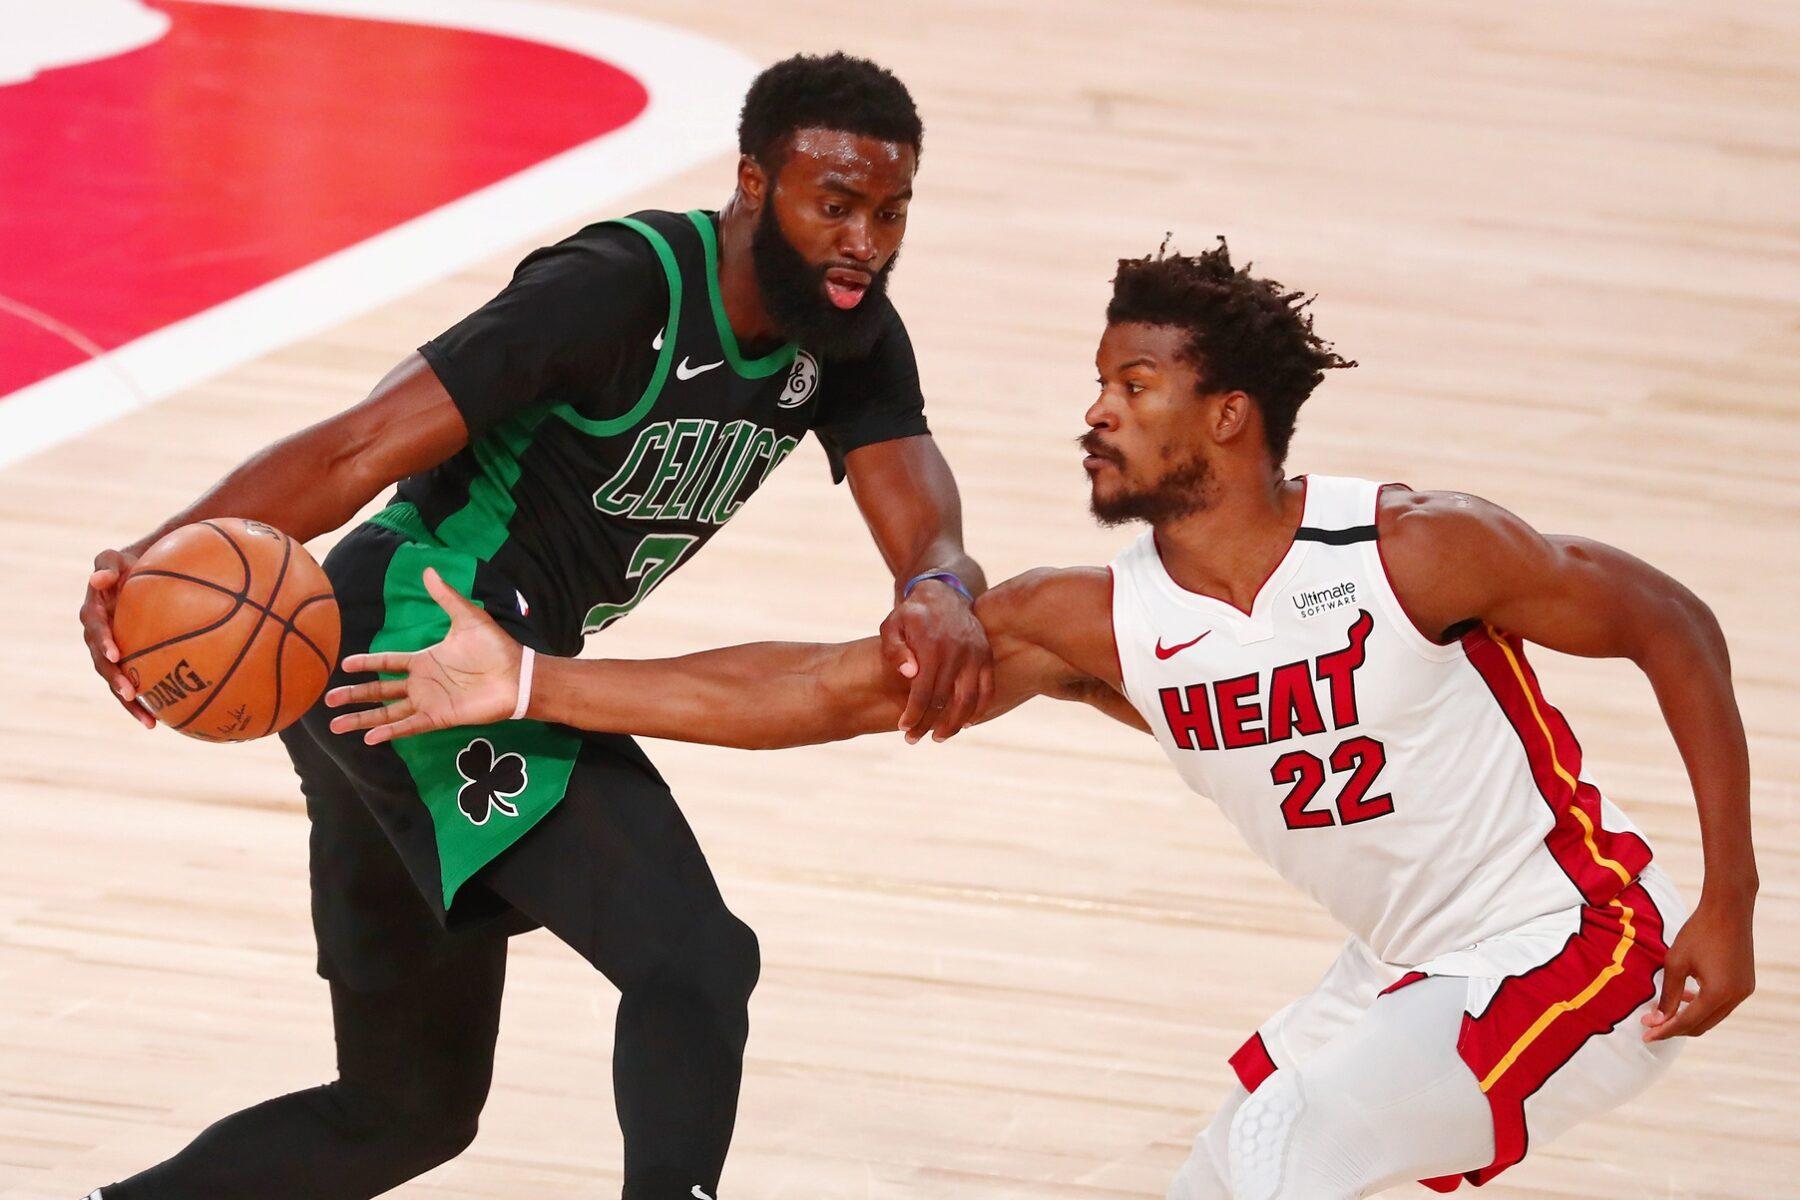 Miami Heat Superstar Jimmy Butler S Immediate Reaction To Going Up 2 0 On Boston Celtics Heat Nation